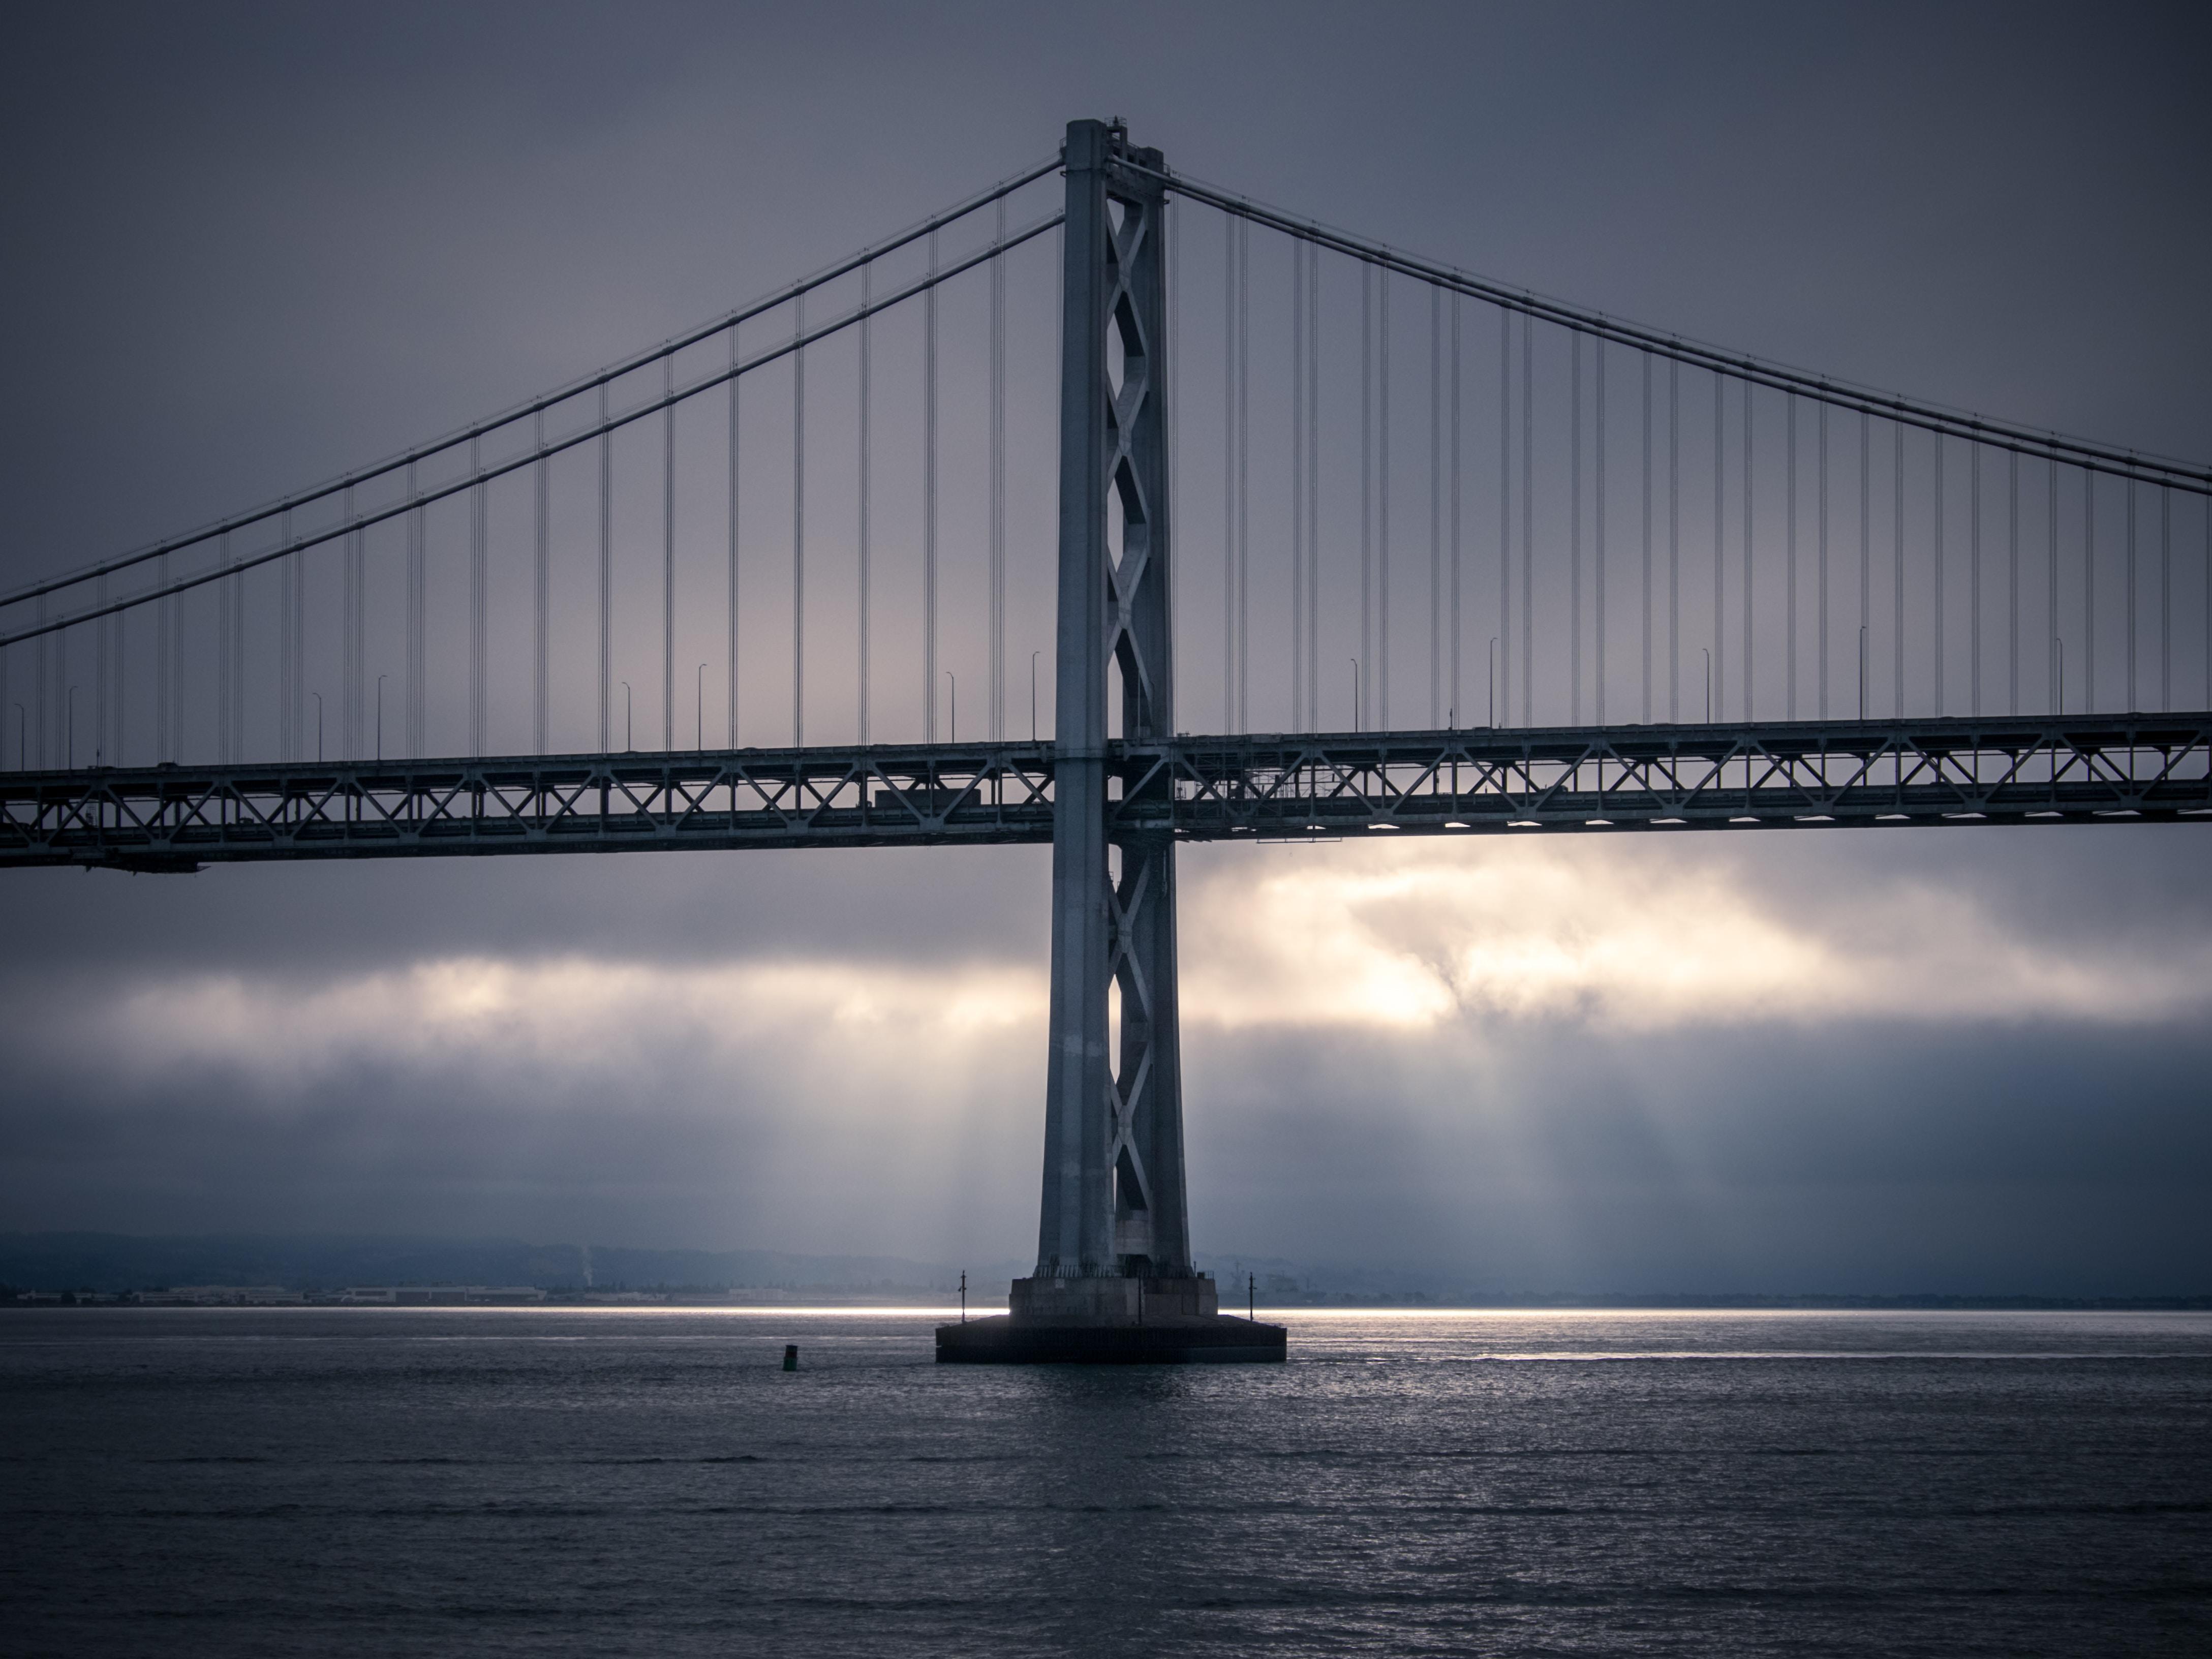 architectural photo of gray metal bridge during daytime